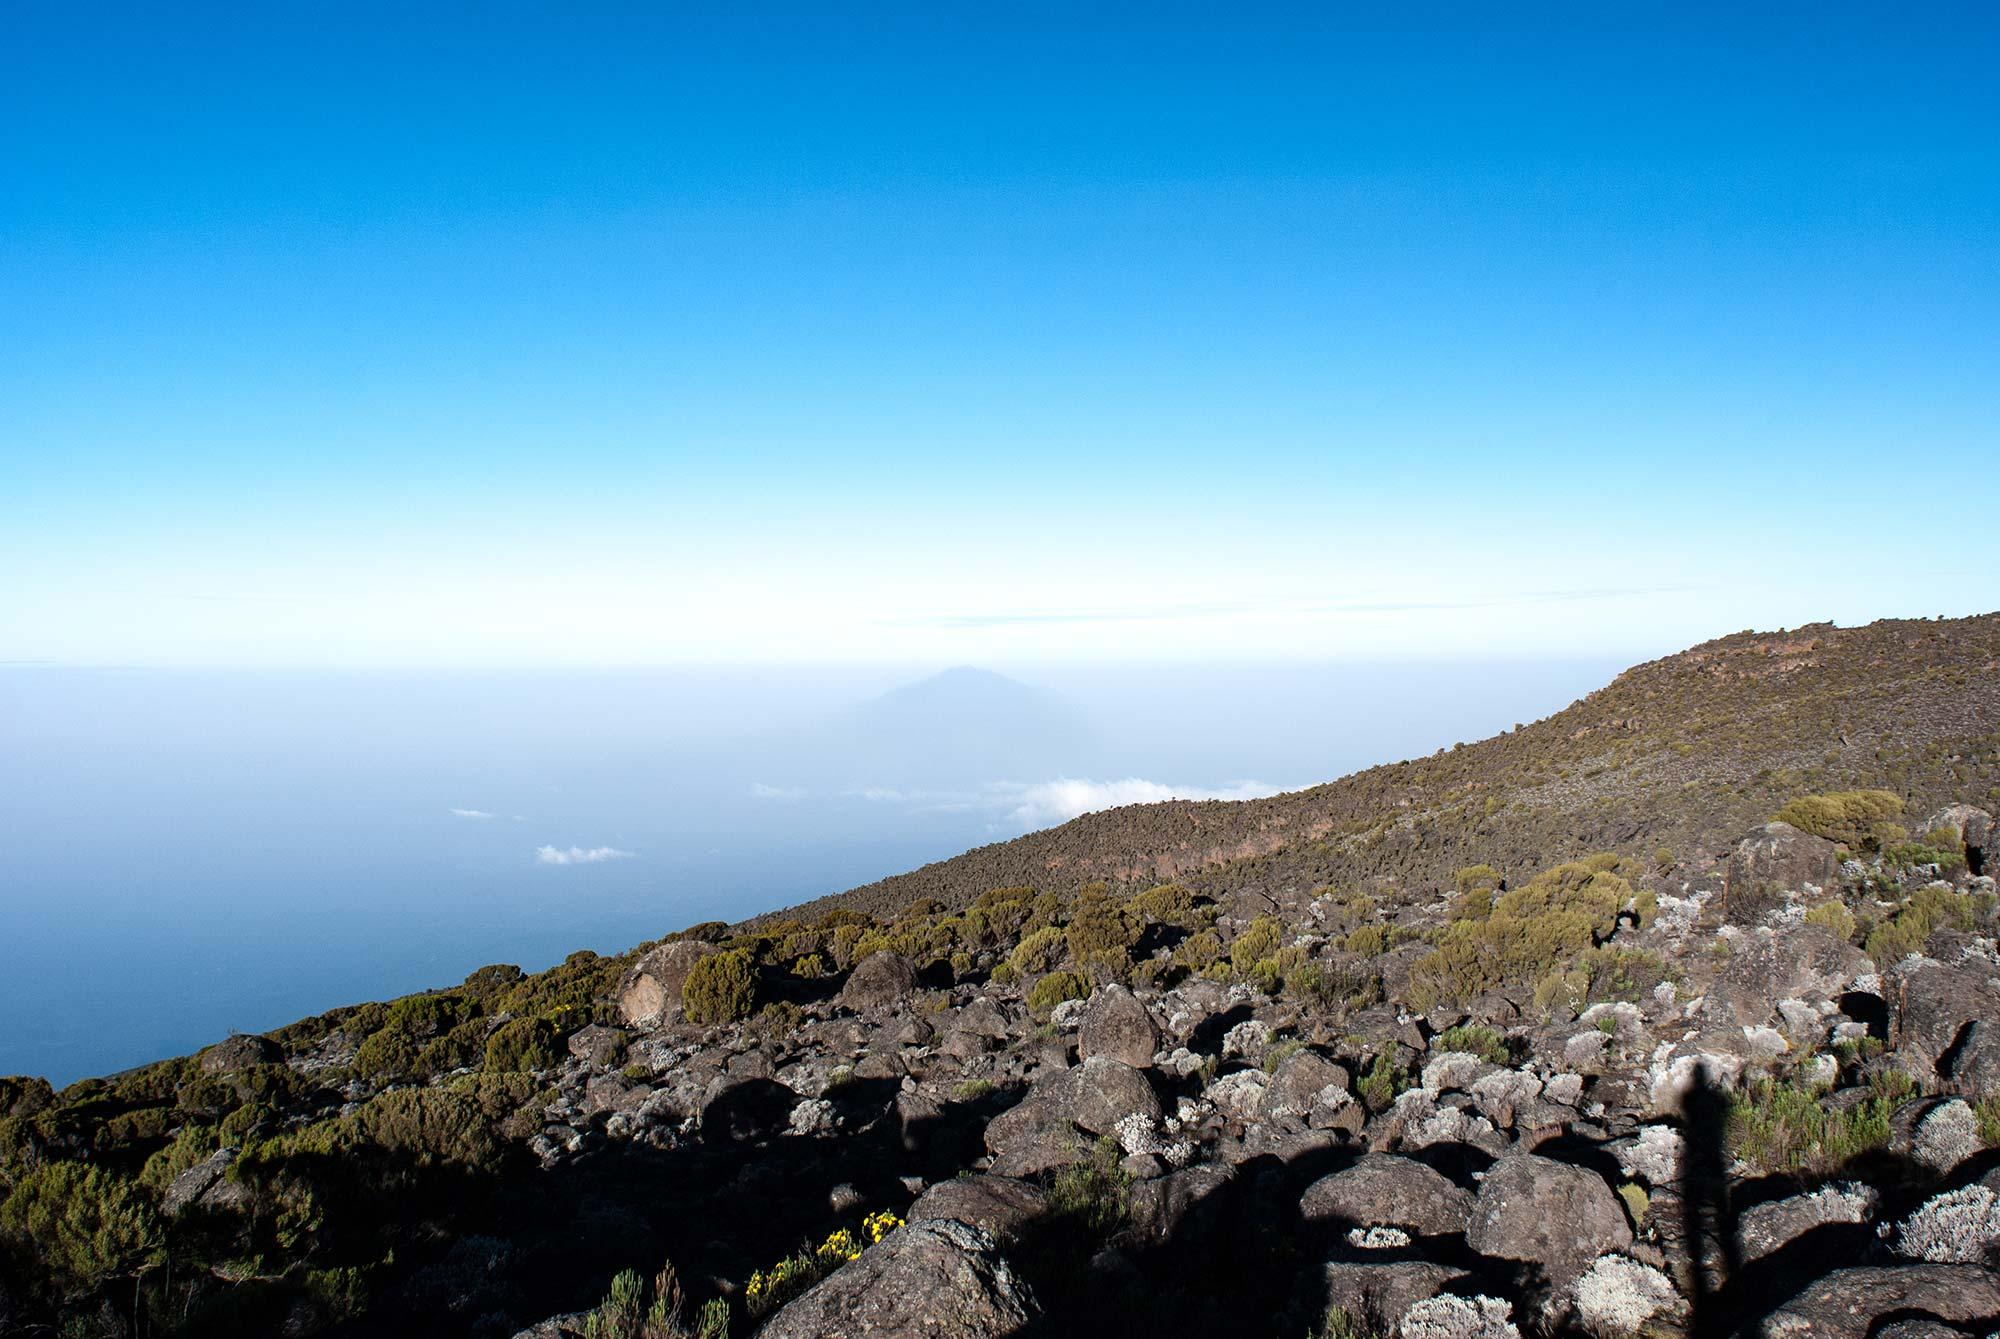 D6-08-meru-pokes-out-of-the-fog-karanga-camp-kilimanjaro.jpg